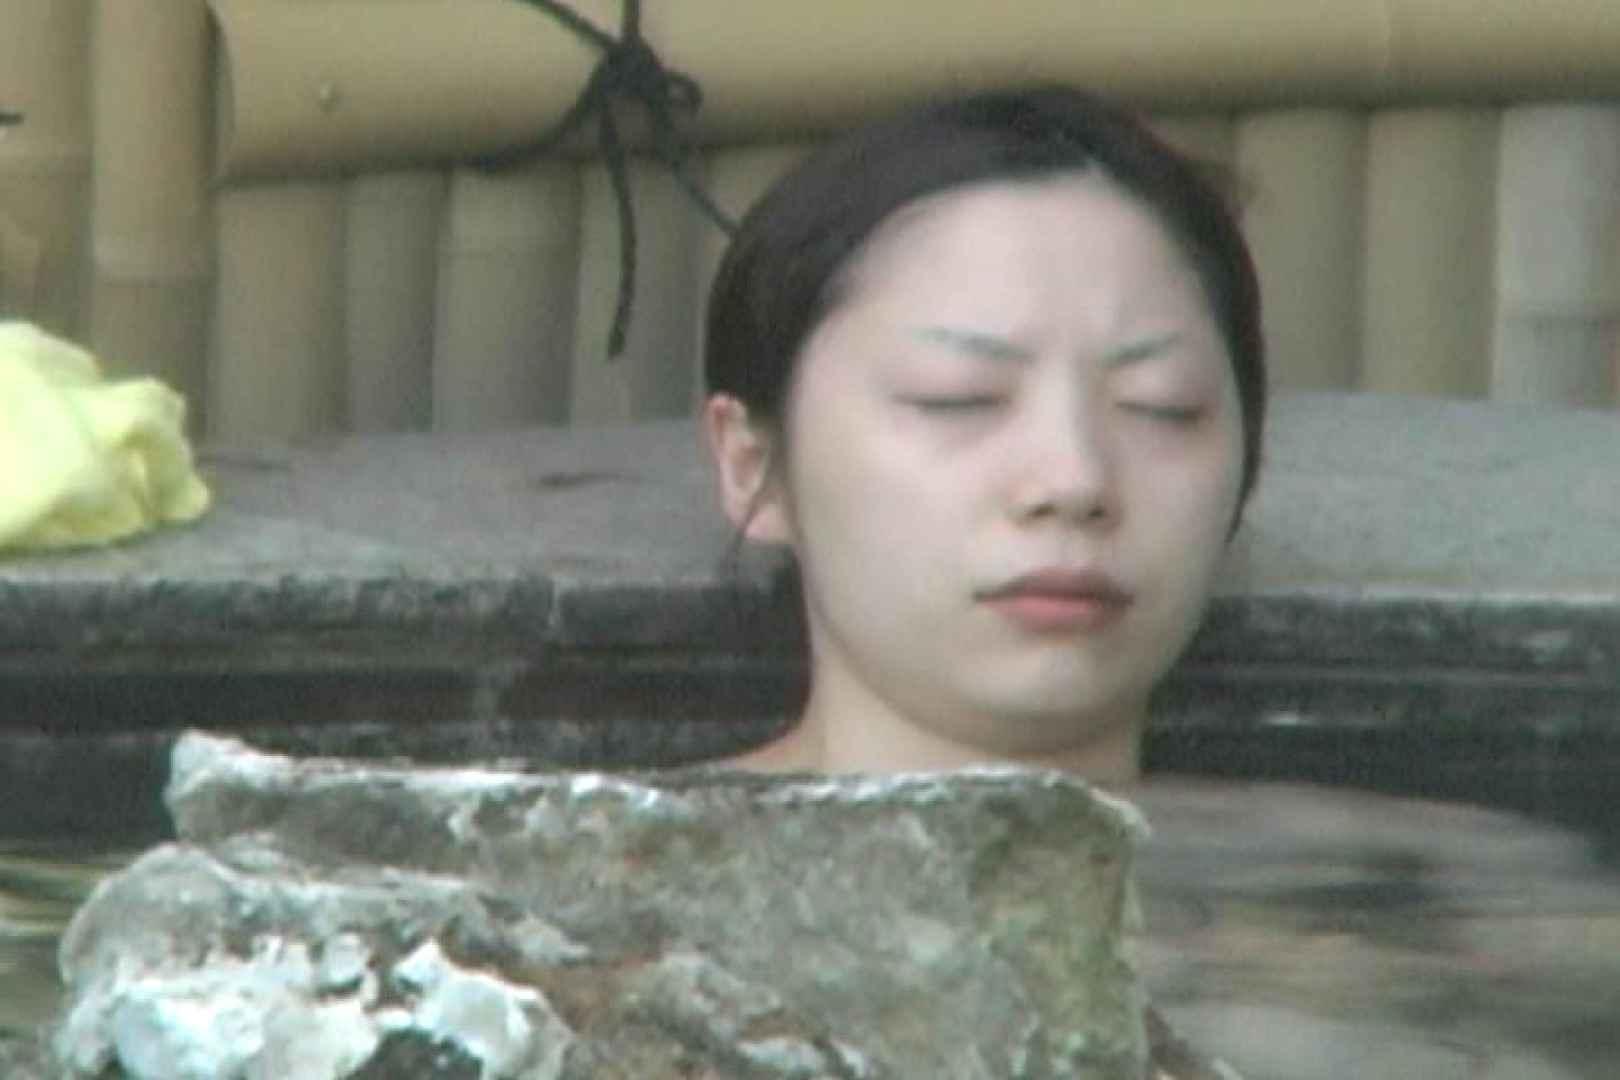 Aquaな露天風呂Vol.596 盗撮シリーズ | 露天風呂編  113PIX 75